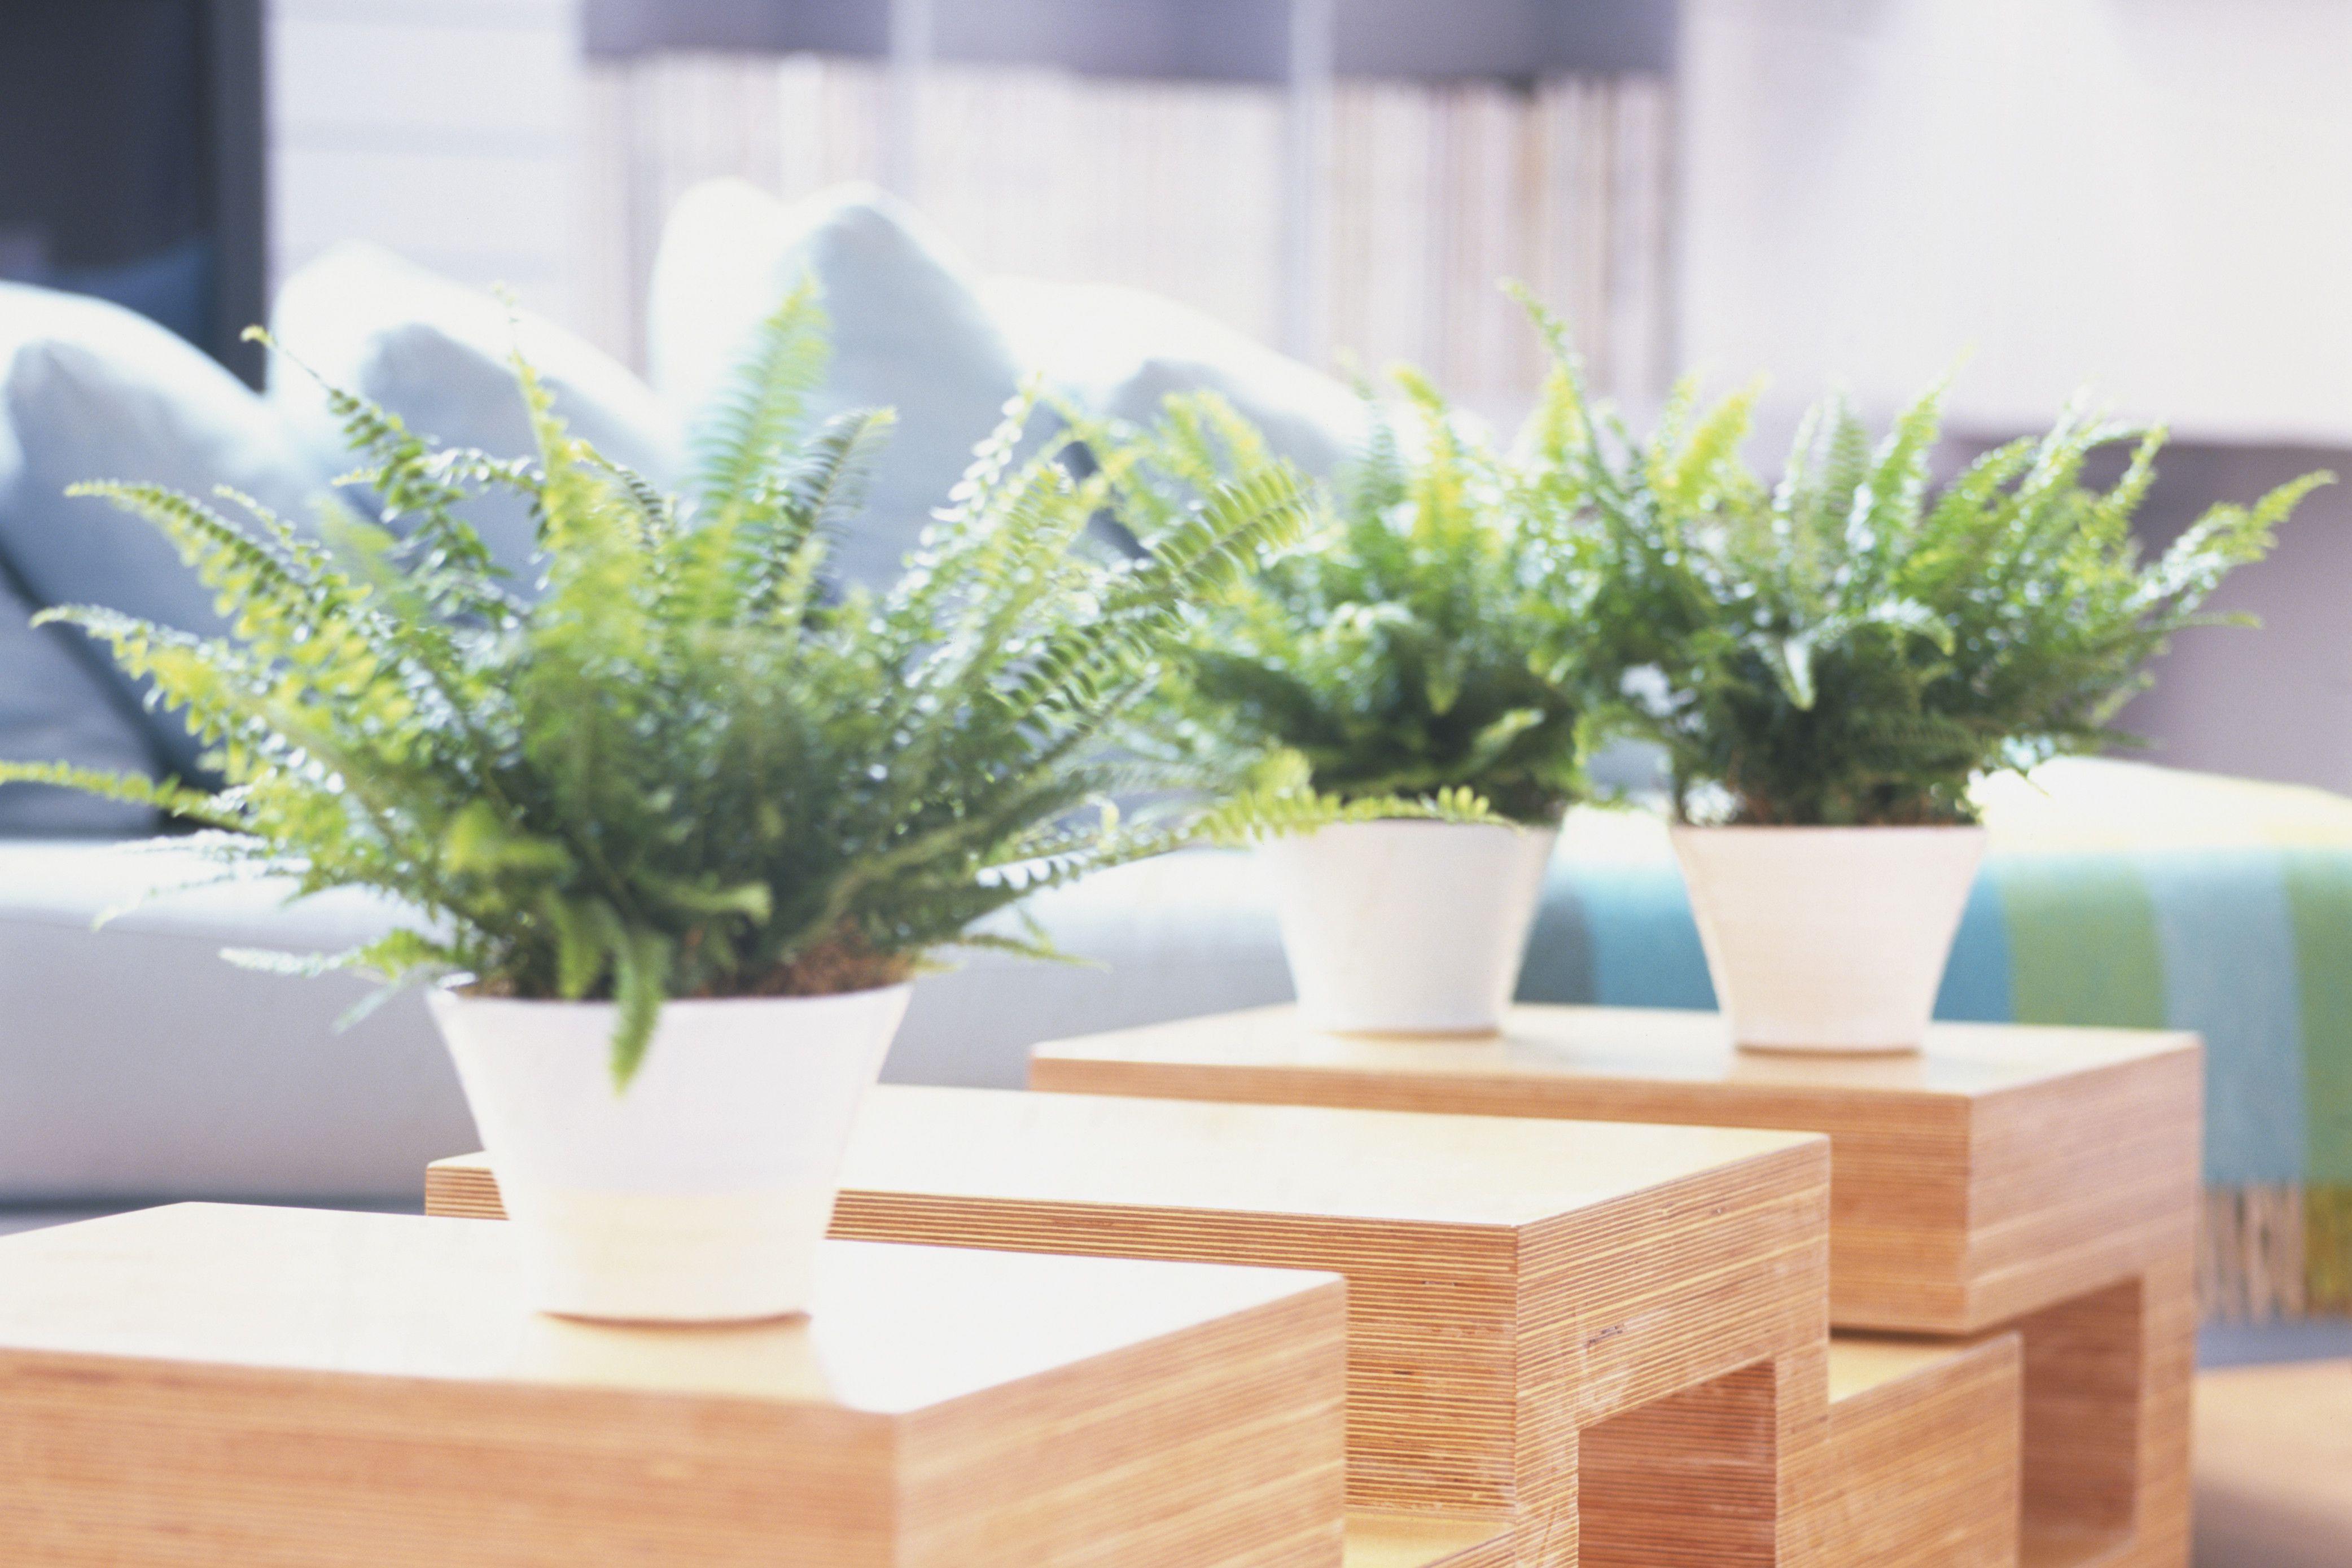 Top 10 Houseplants That Clean Indoor Air